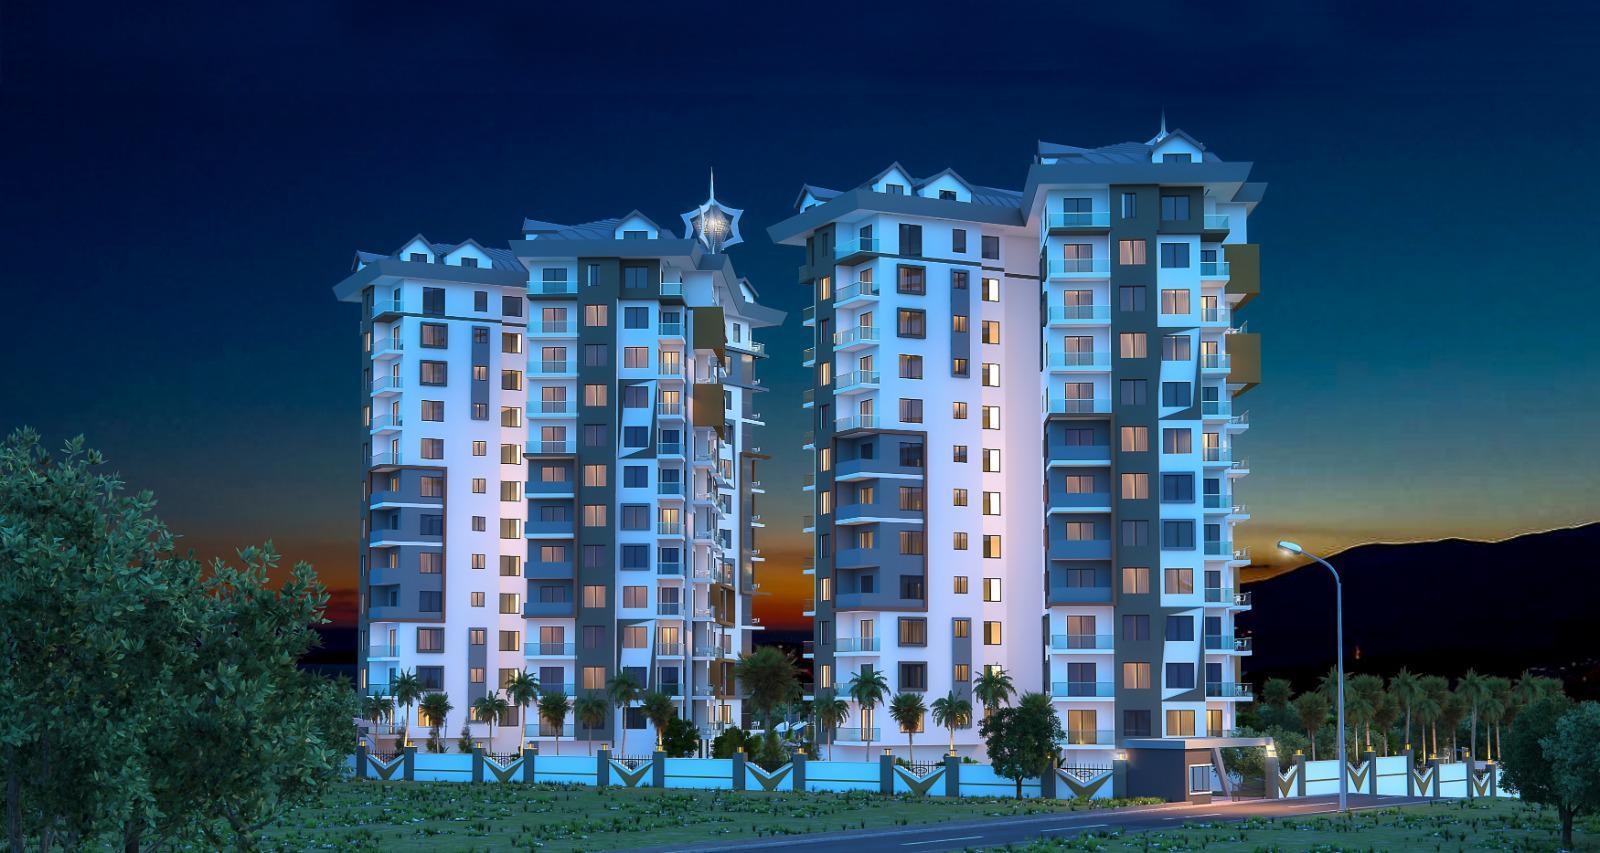 Квартиры и пентхаусы в комплексе с богатой инфраструктурой район Махмутлар - Фото 6